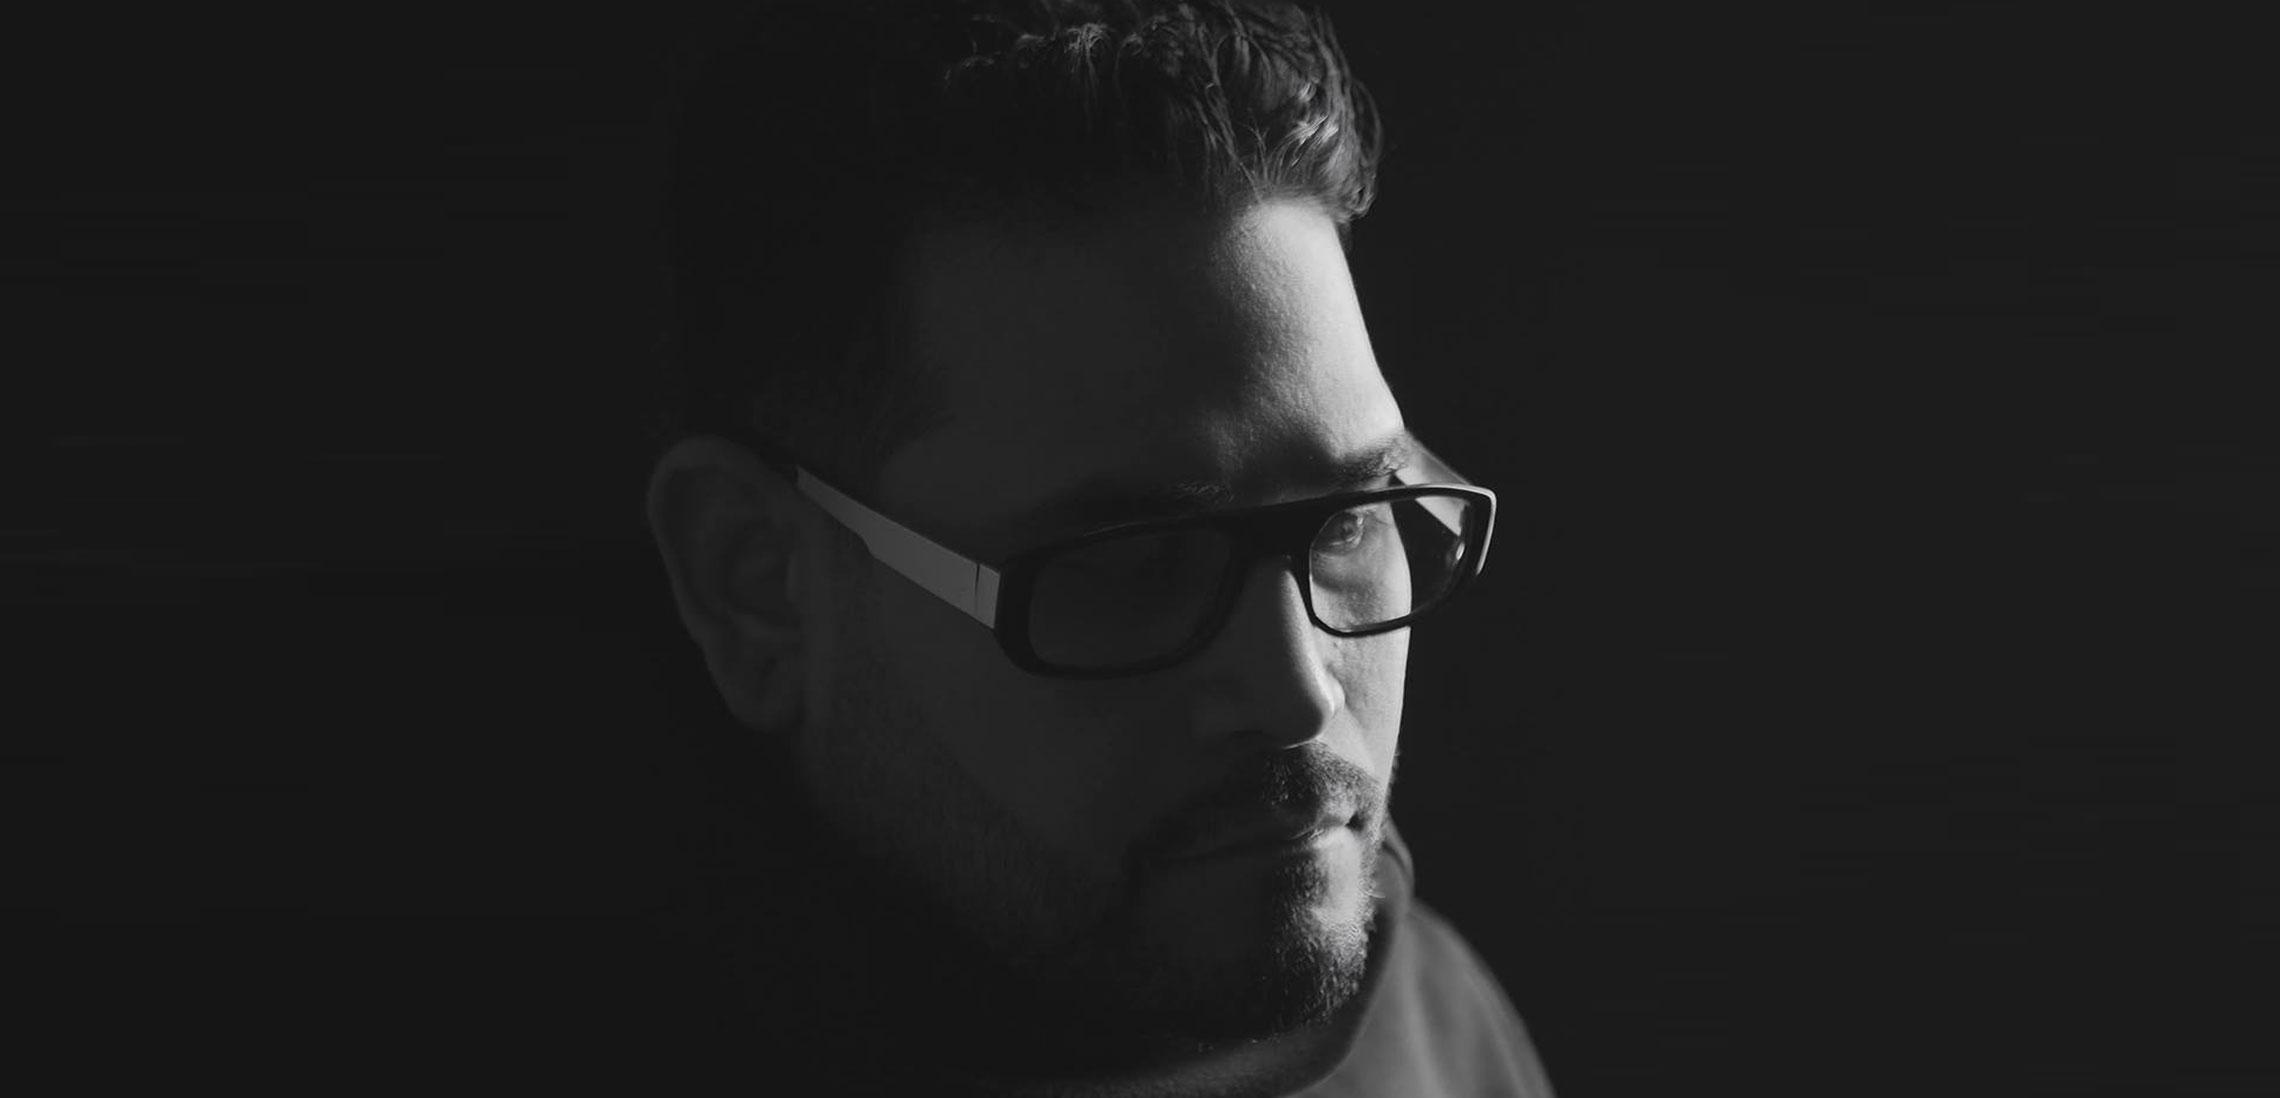 Junior Sanchez - Brain EP hero